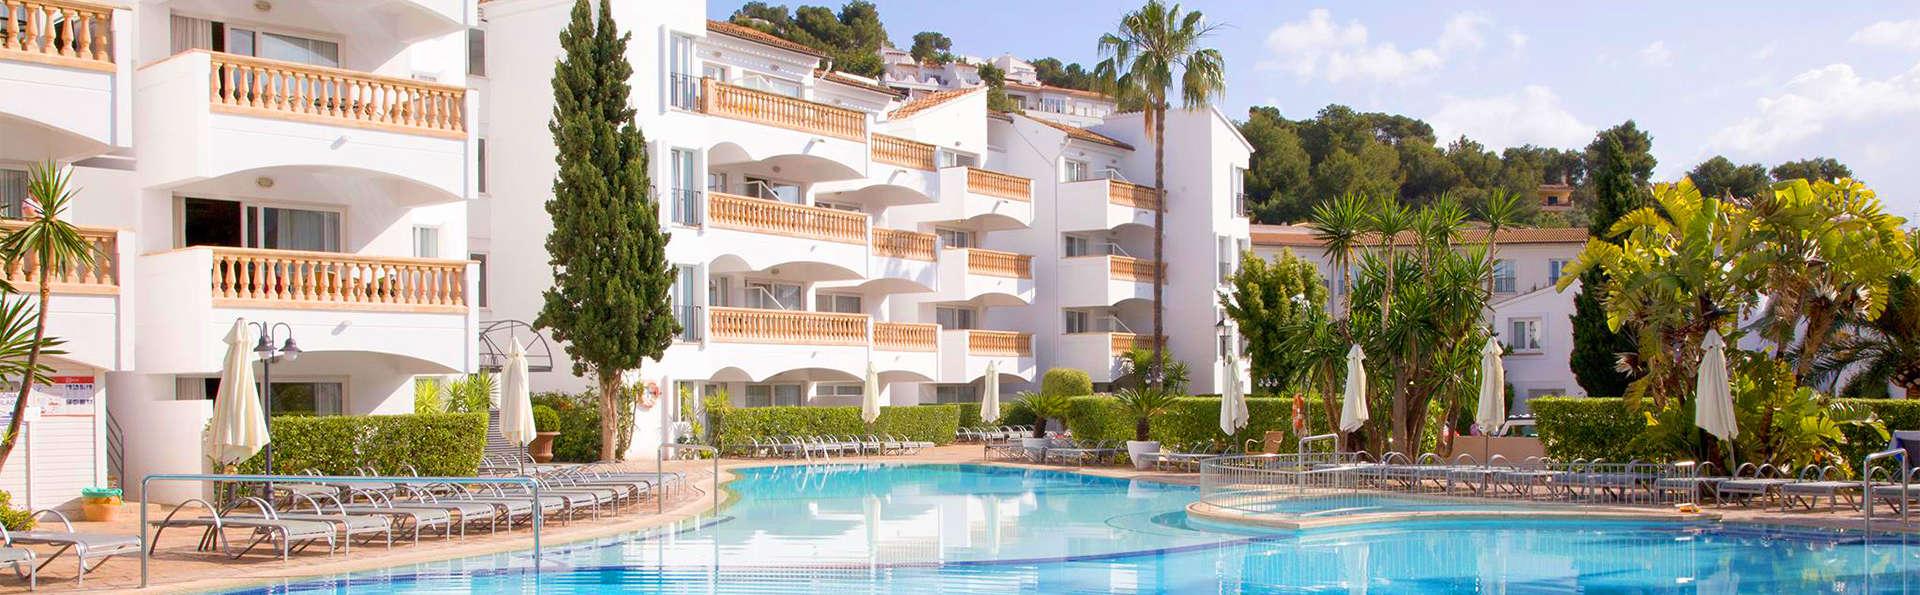 Aparthotel La Pérgola  - EDIT_Pool3.jpg